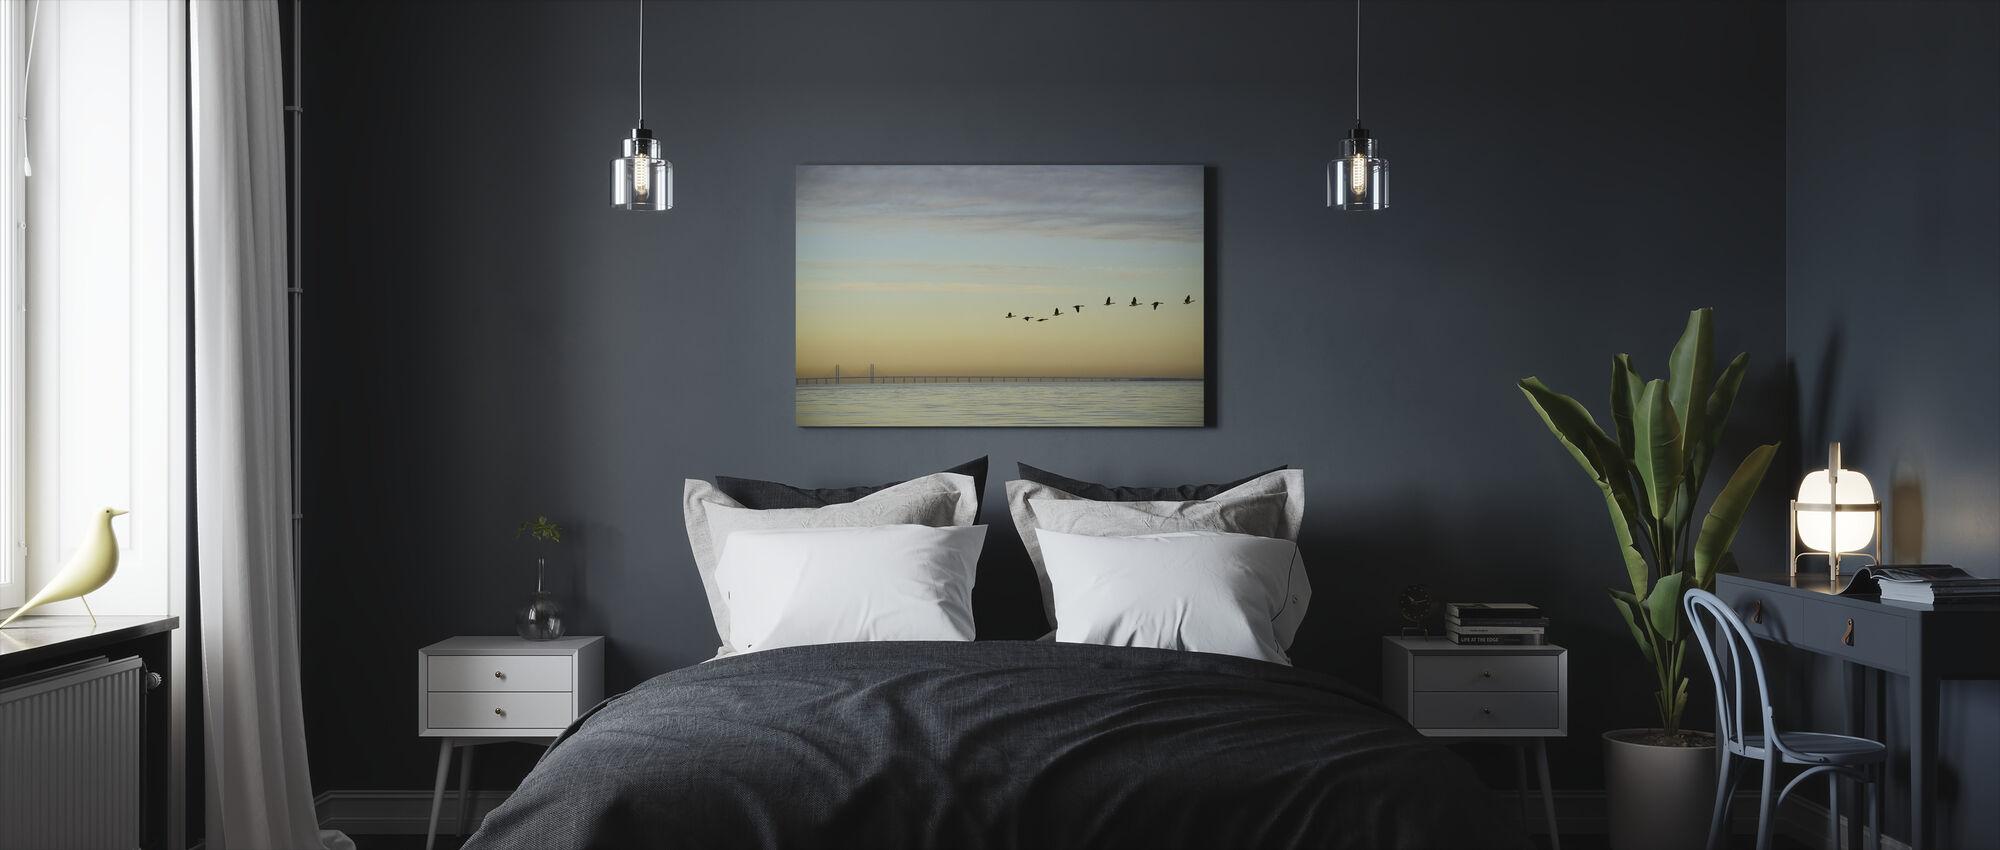 Lintuparvi - Canvastaulu - Makuuhuone